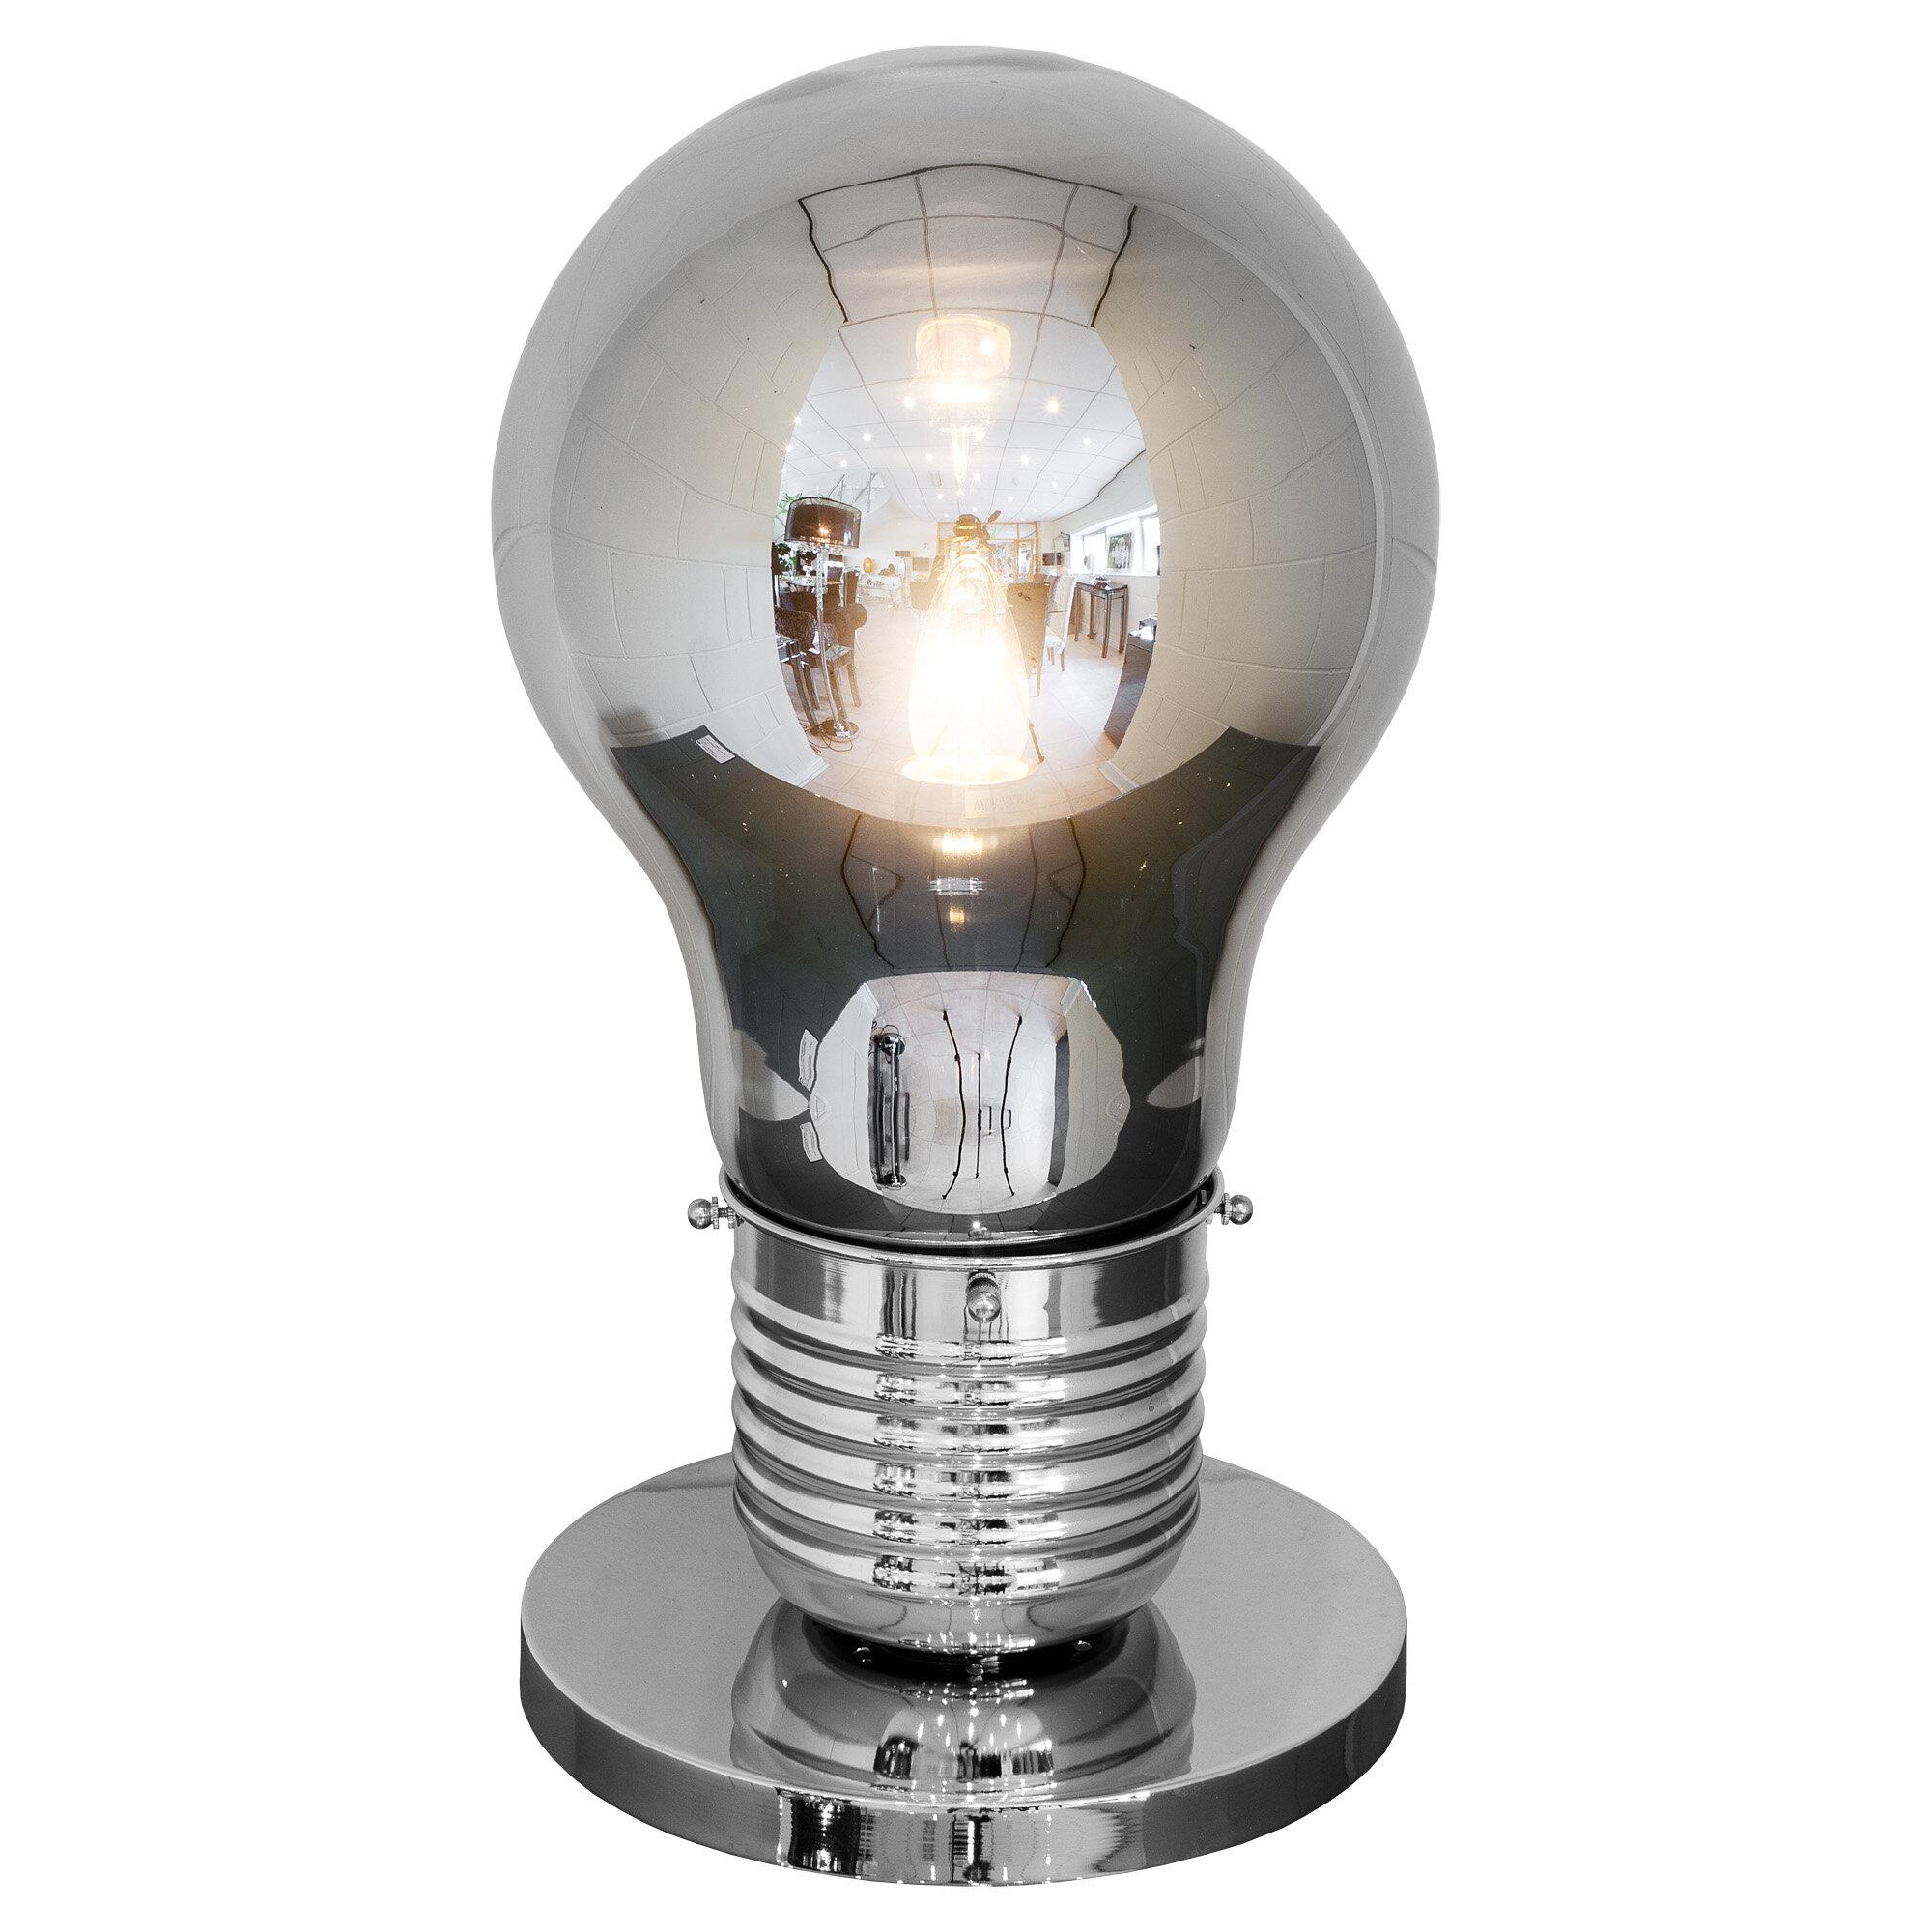 Bulb Shaped 50cm Novelty Lamp